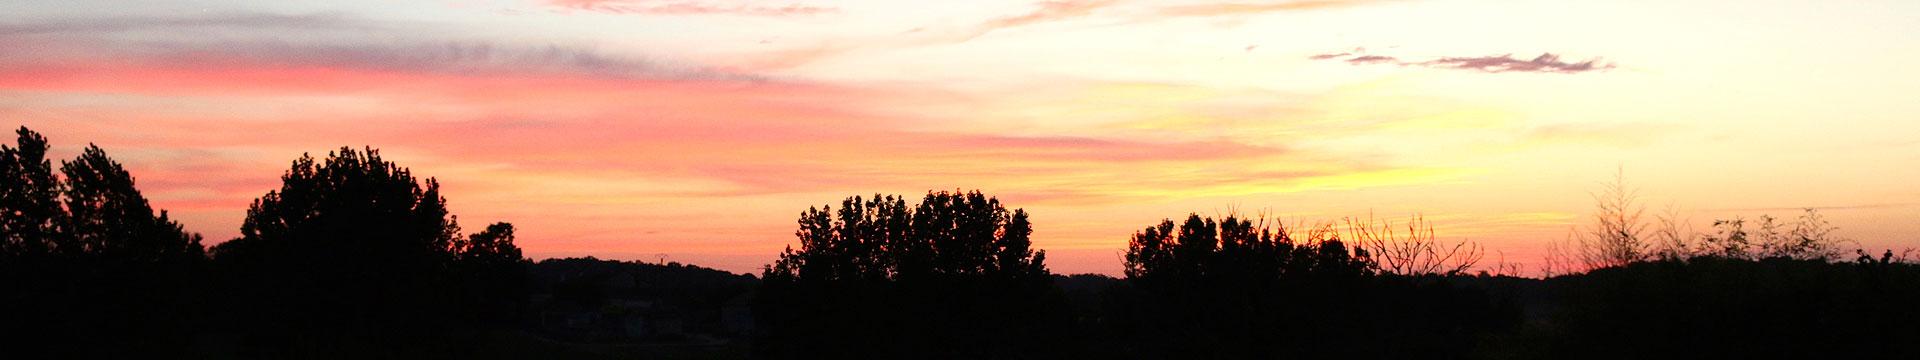 BE_PageHero-1920x330_Sunset01